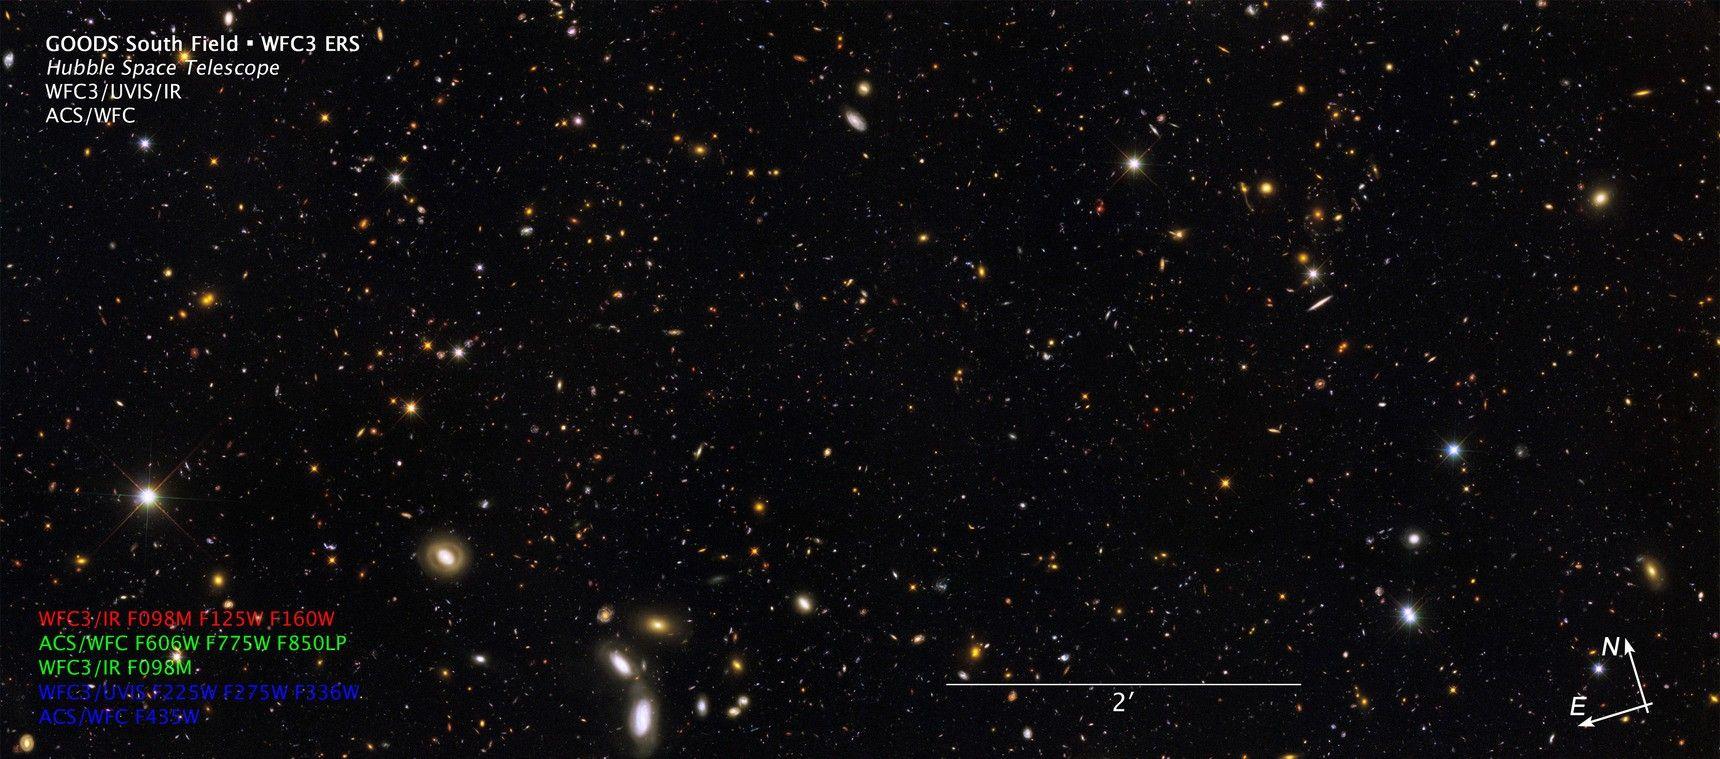 Pin oleh 🌻 di What Did Hubble See on Your Birthday? di 2020